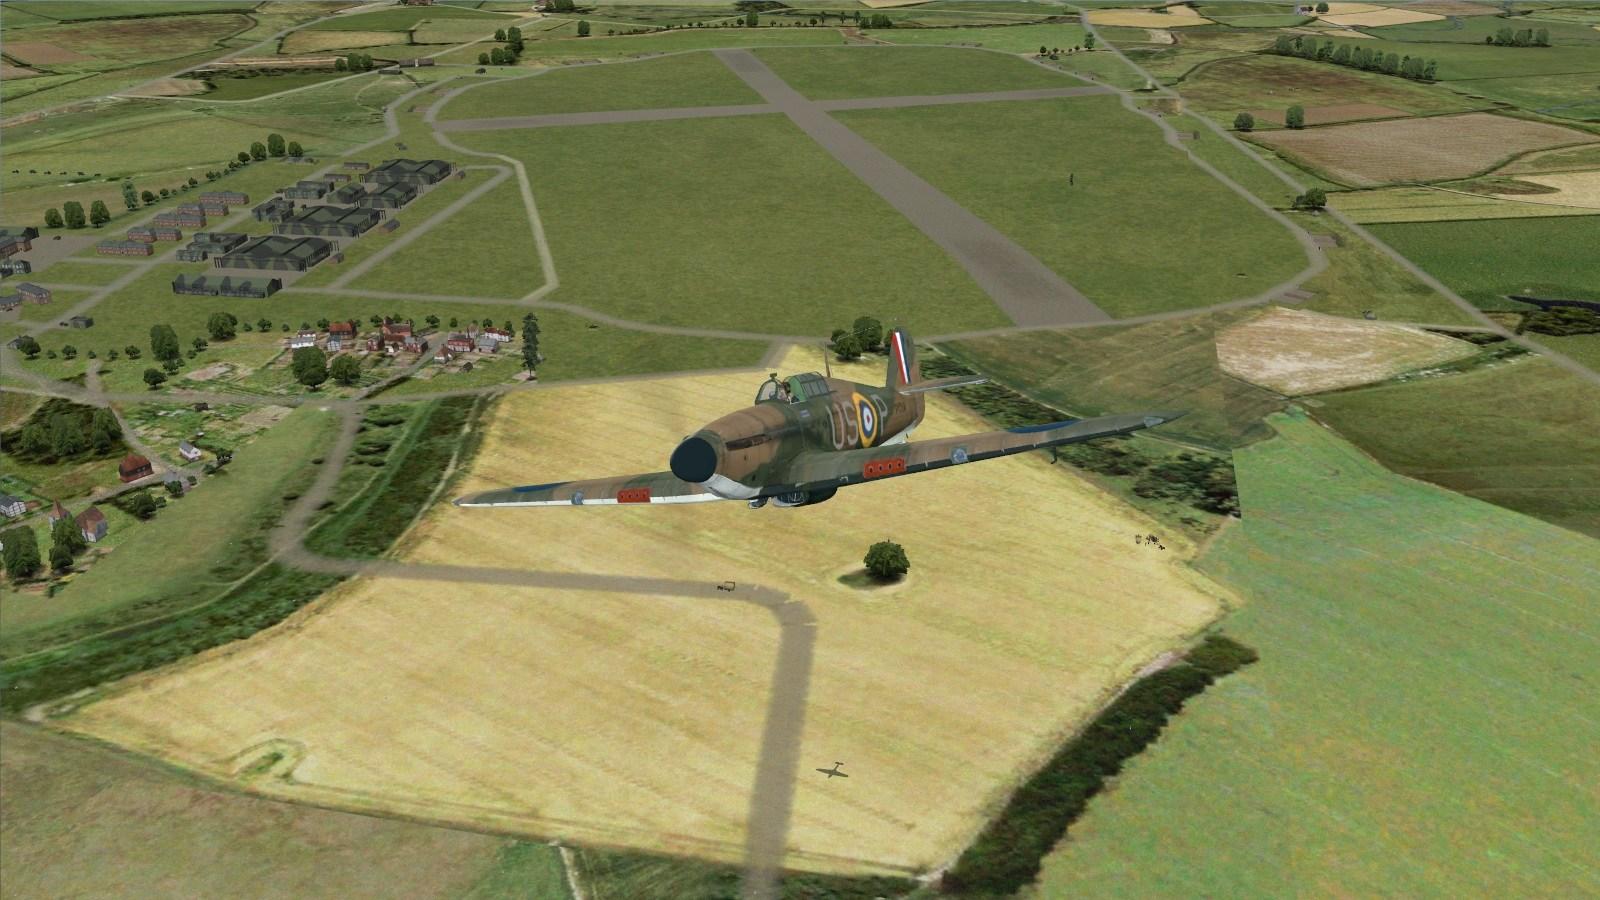 Battle of Britain II - Hurricane I, 56 Squadron at Hawkinge